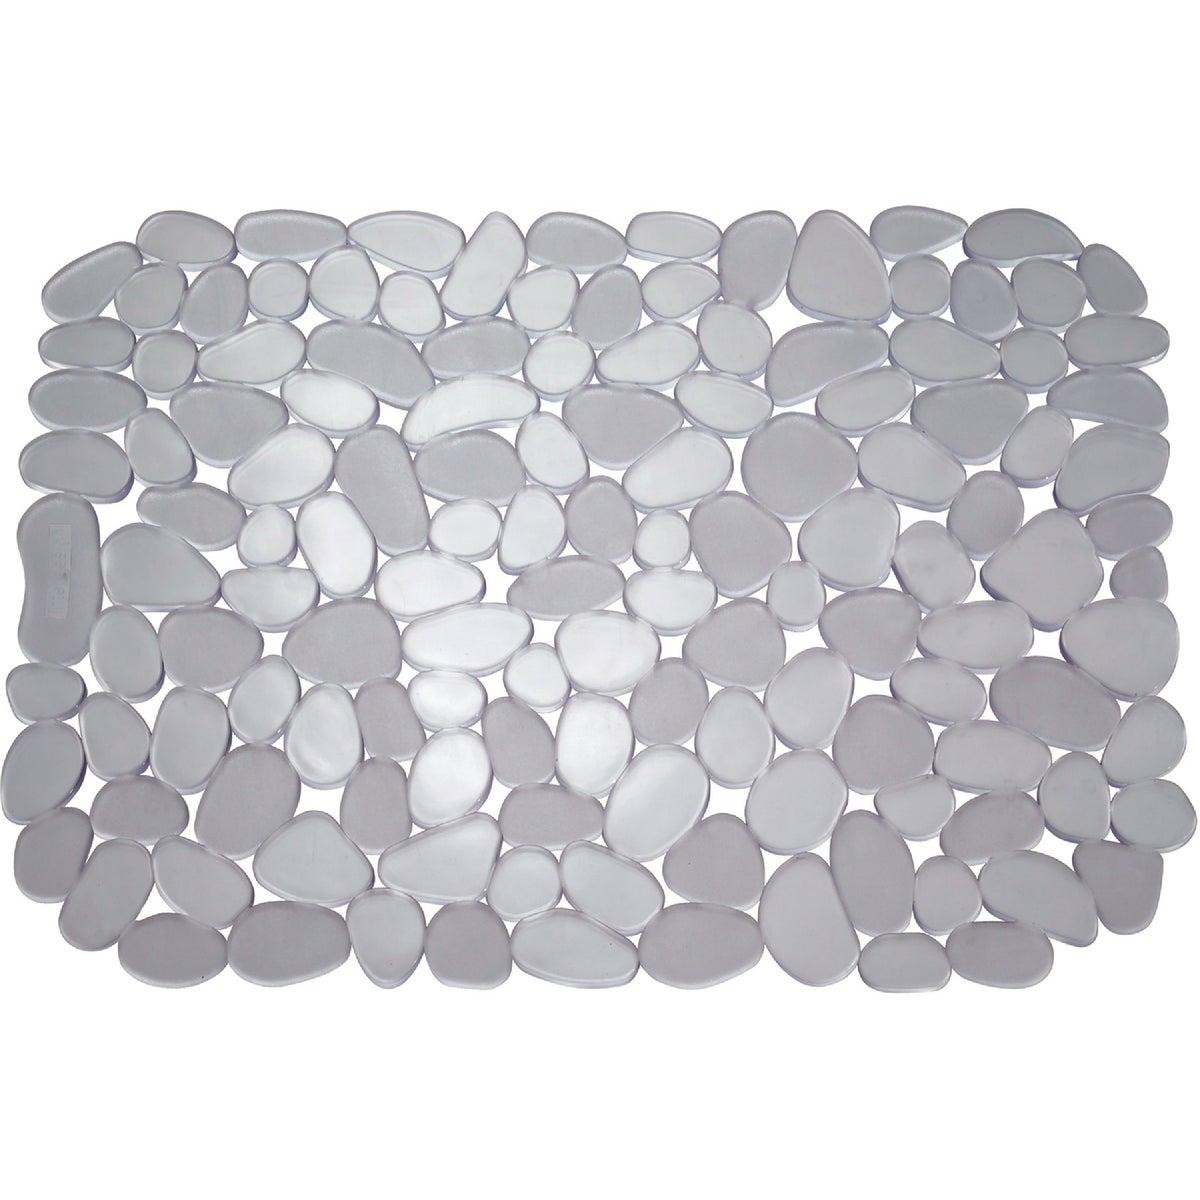 LARGE GRAPHITE SINK MAT - 60663 by Interdesign Inc